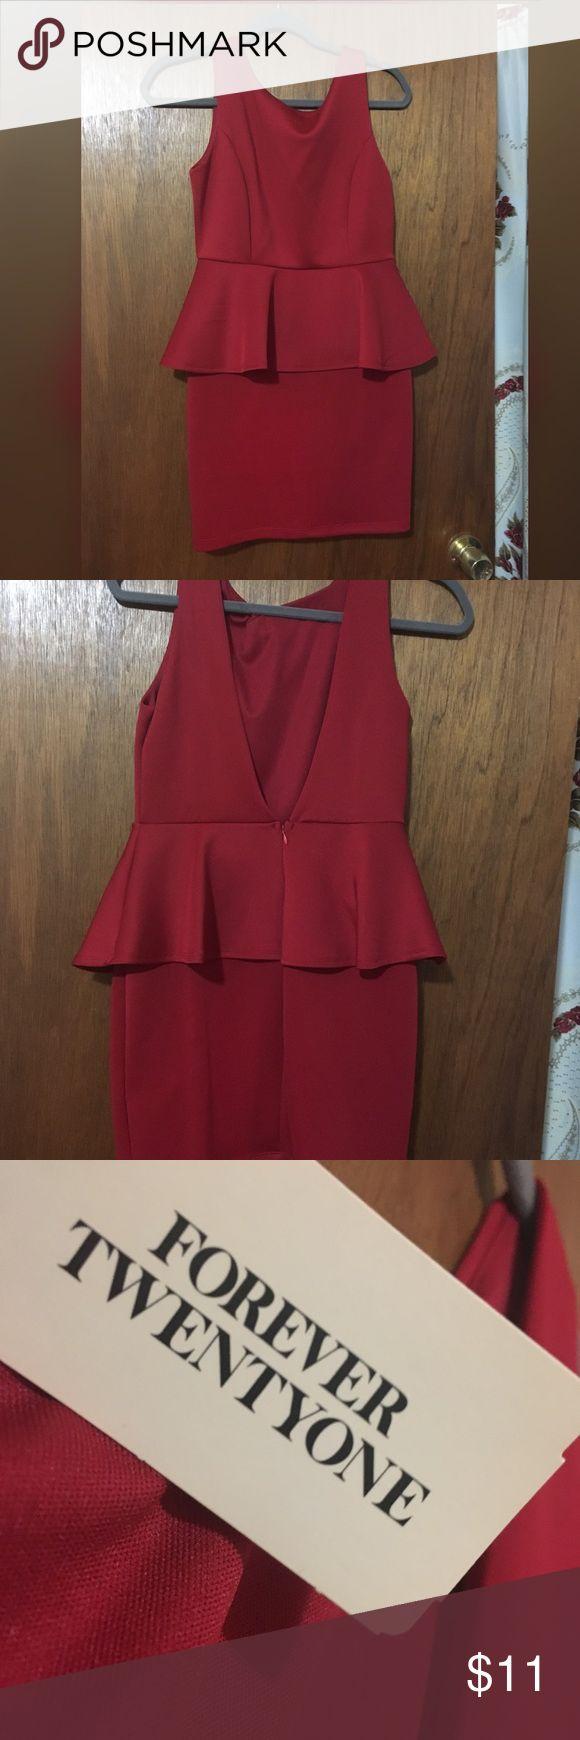 Red Peplum Dress Deep red color Deep V back Sleeveless Dress Forever 21 Dresses